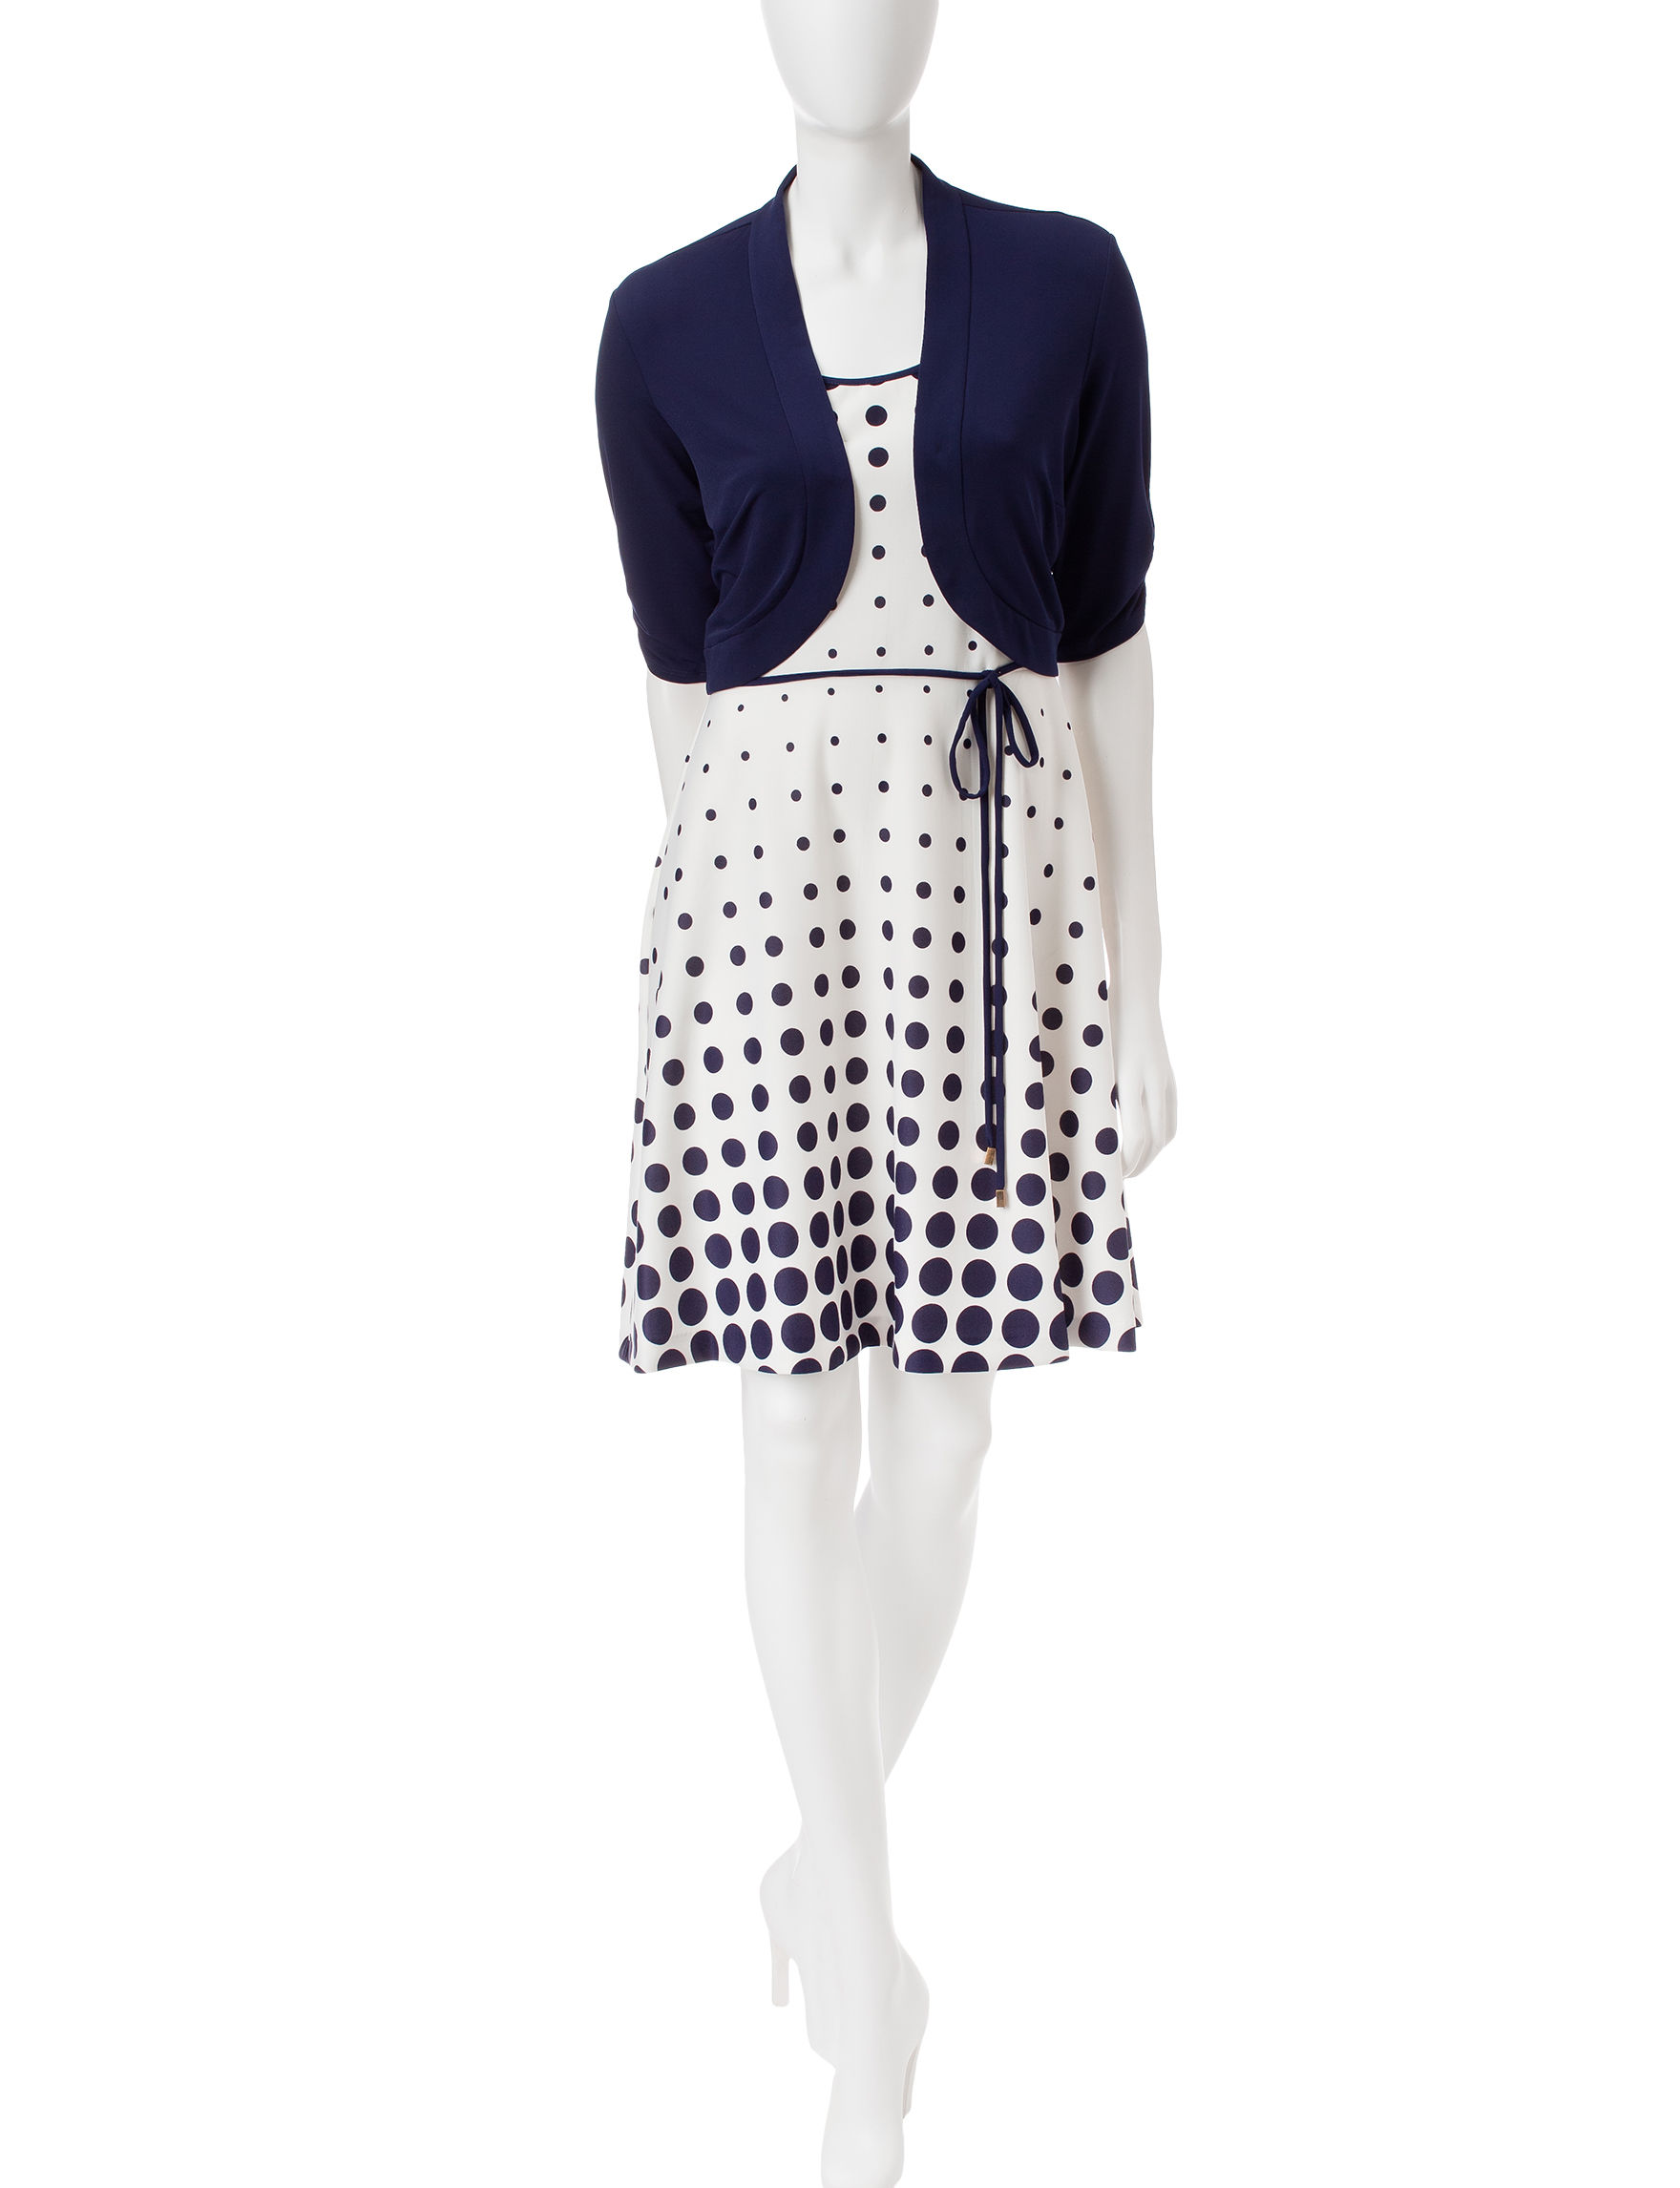 Studio One Blue Everyday & Casual Jacket Dresses